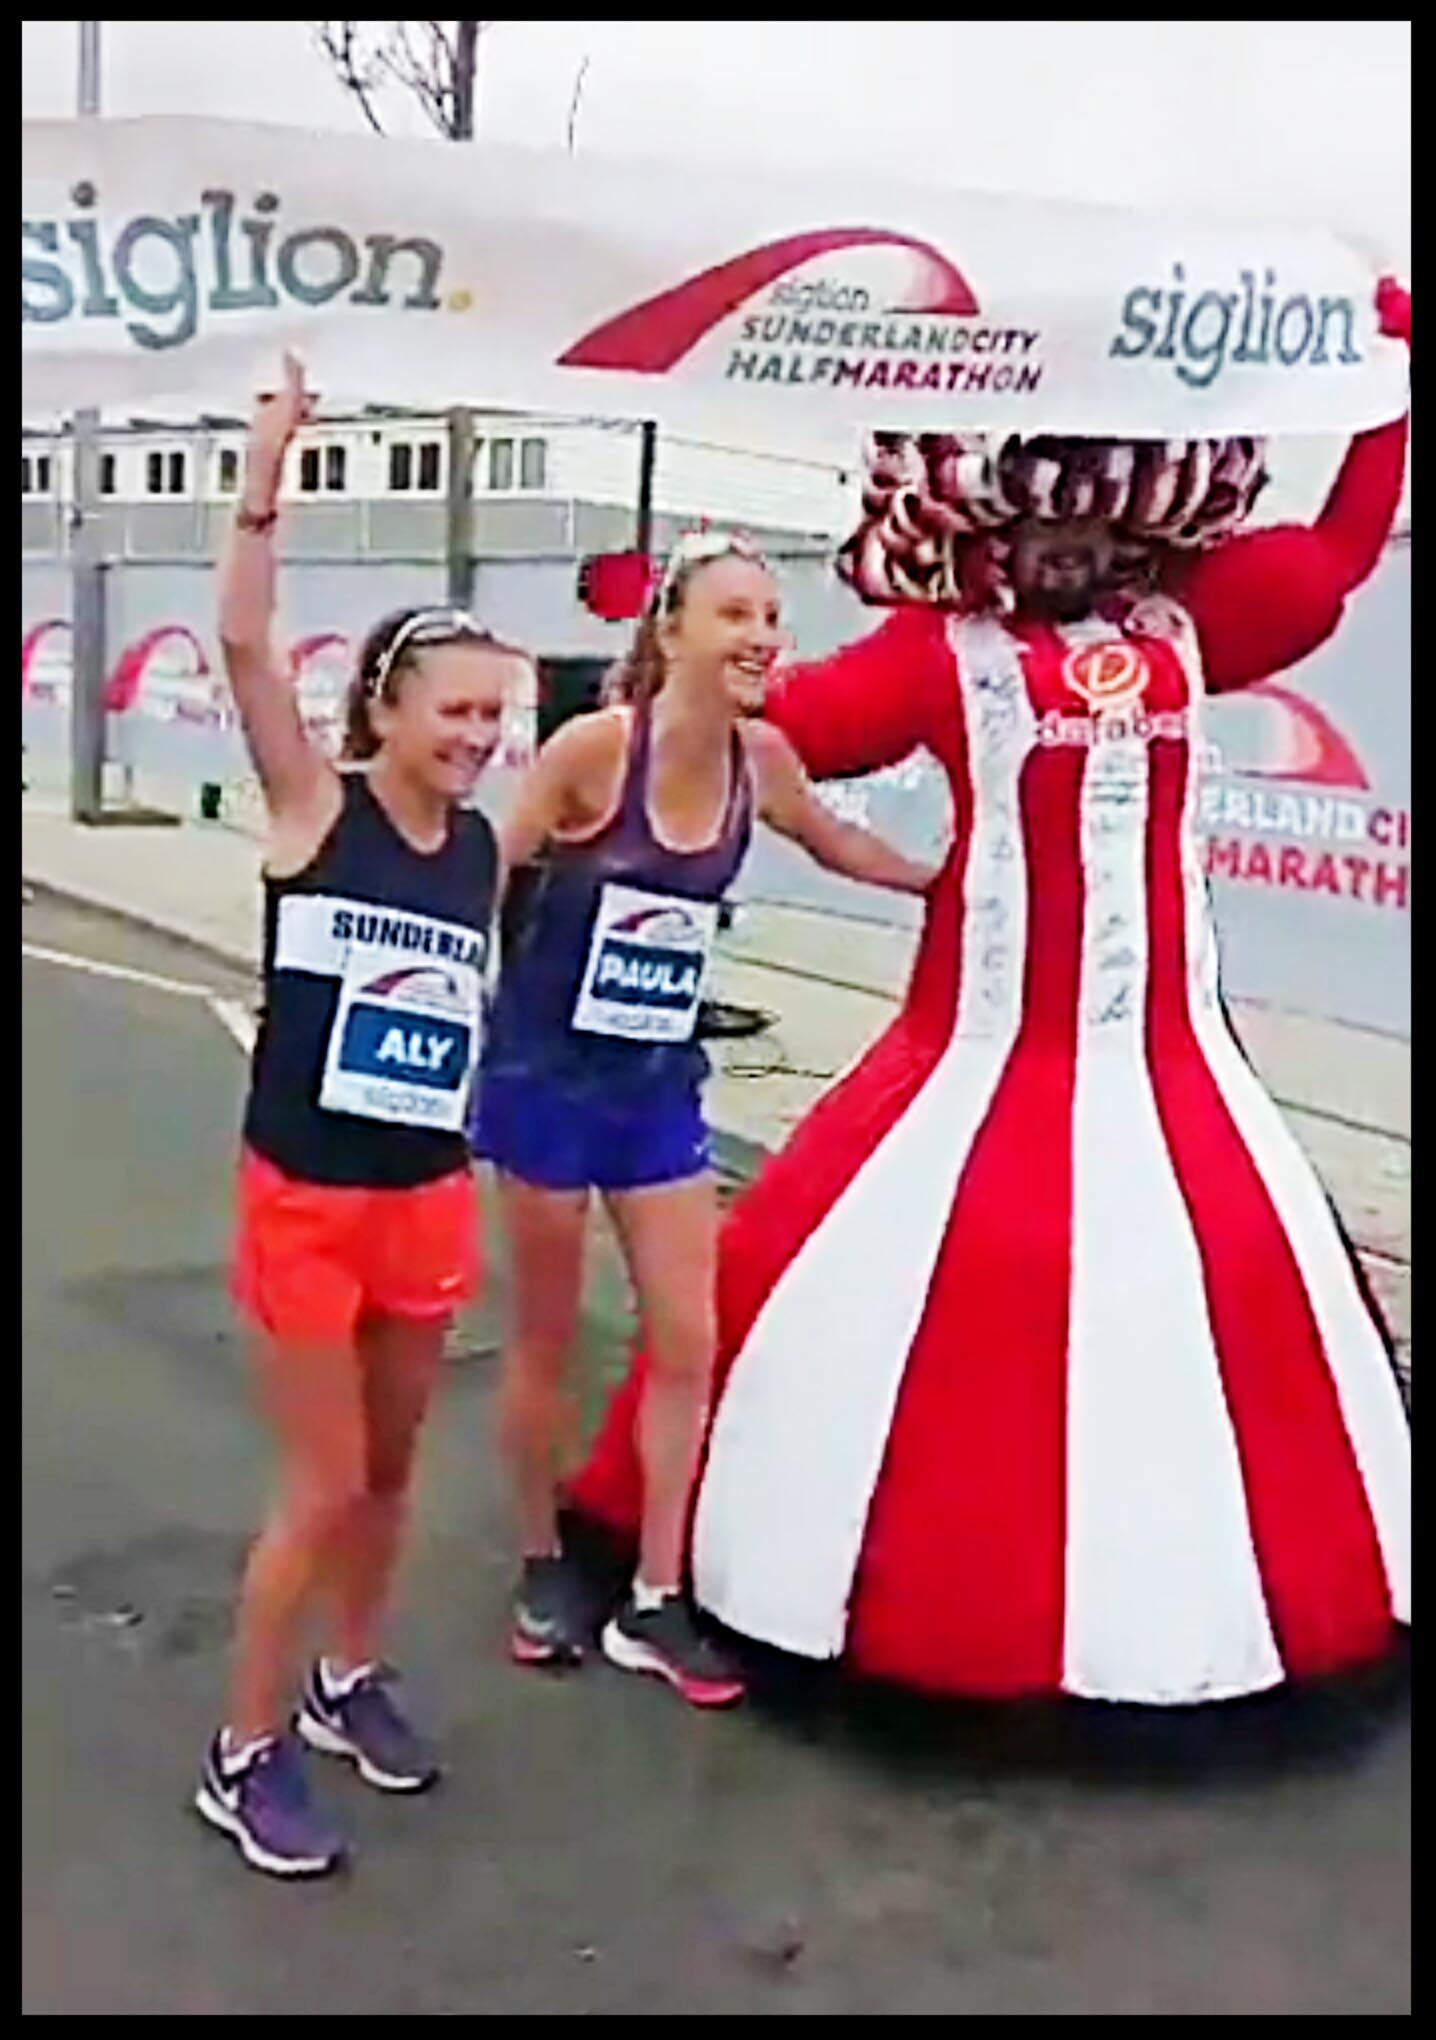 Big-Pink-Dress-THAT-Branding-Company-Sunderland-10km-2017-00129